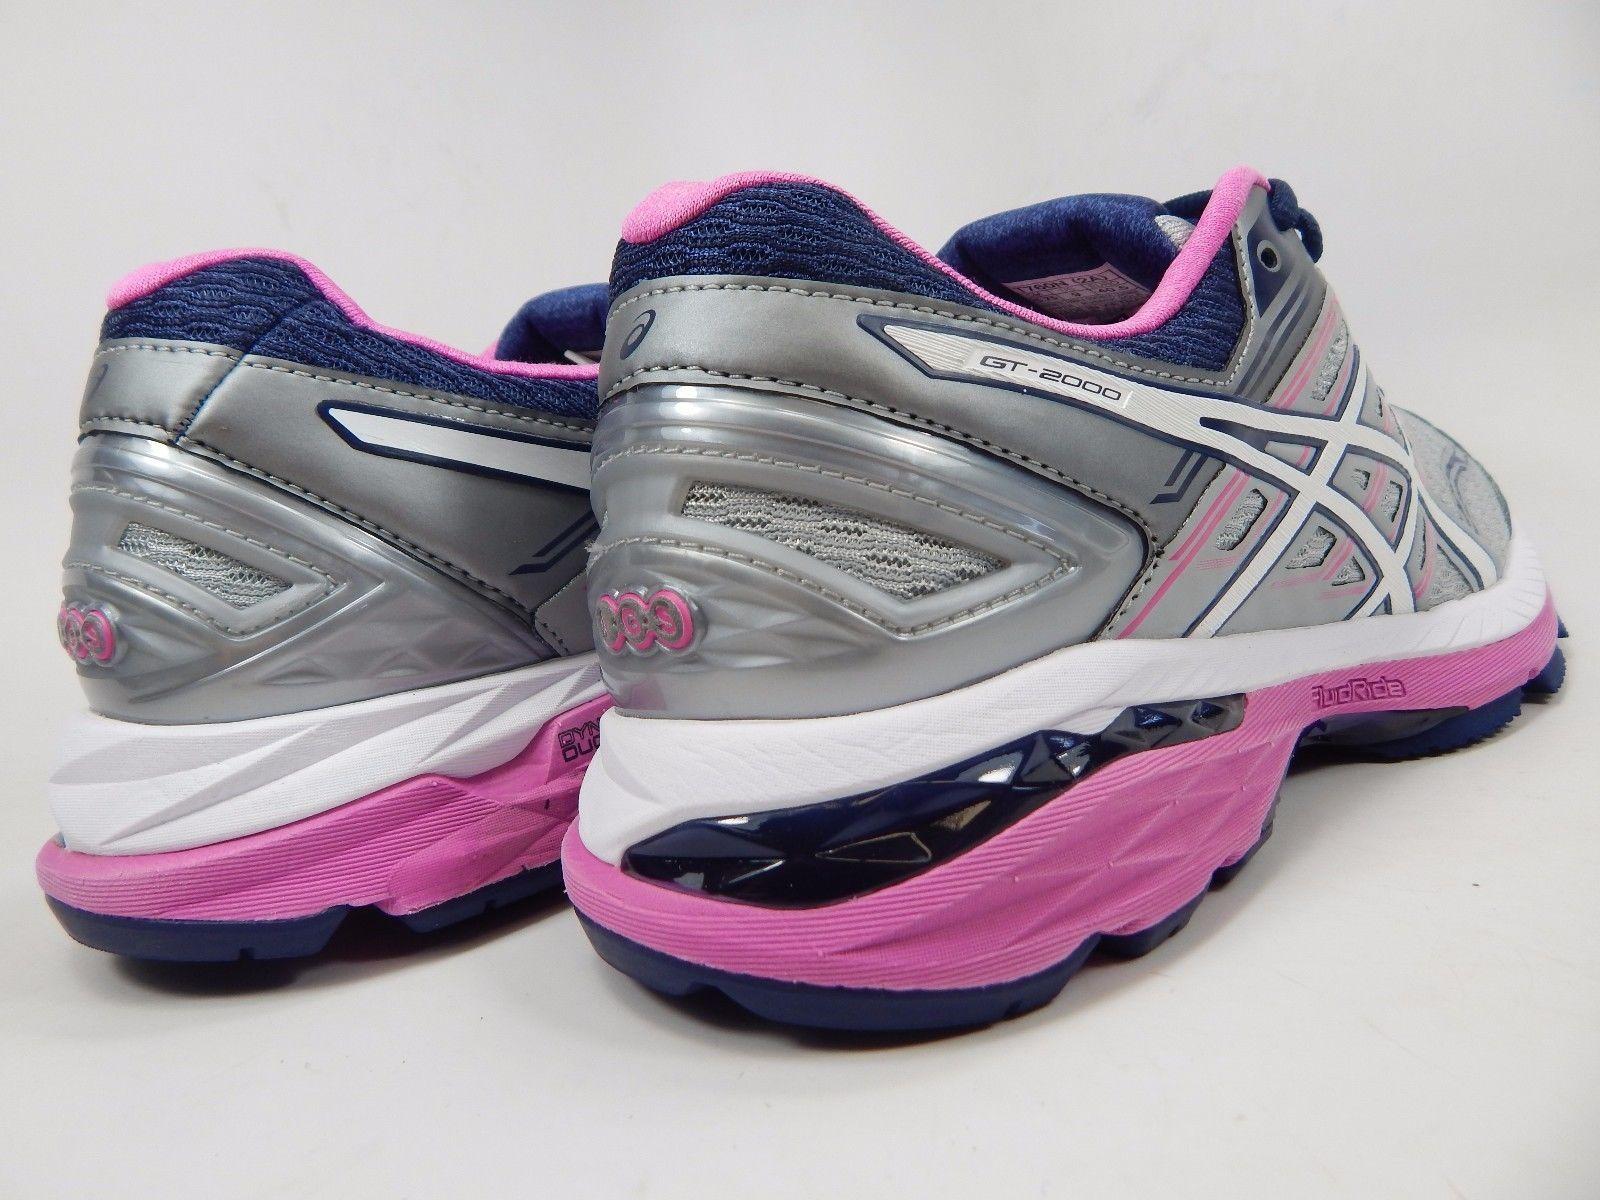 Asics GT 2000 v 5 Women's Running Shoes Sz US 9 2A NARROW EU 40.5 Silver T760N